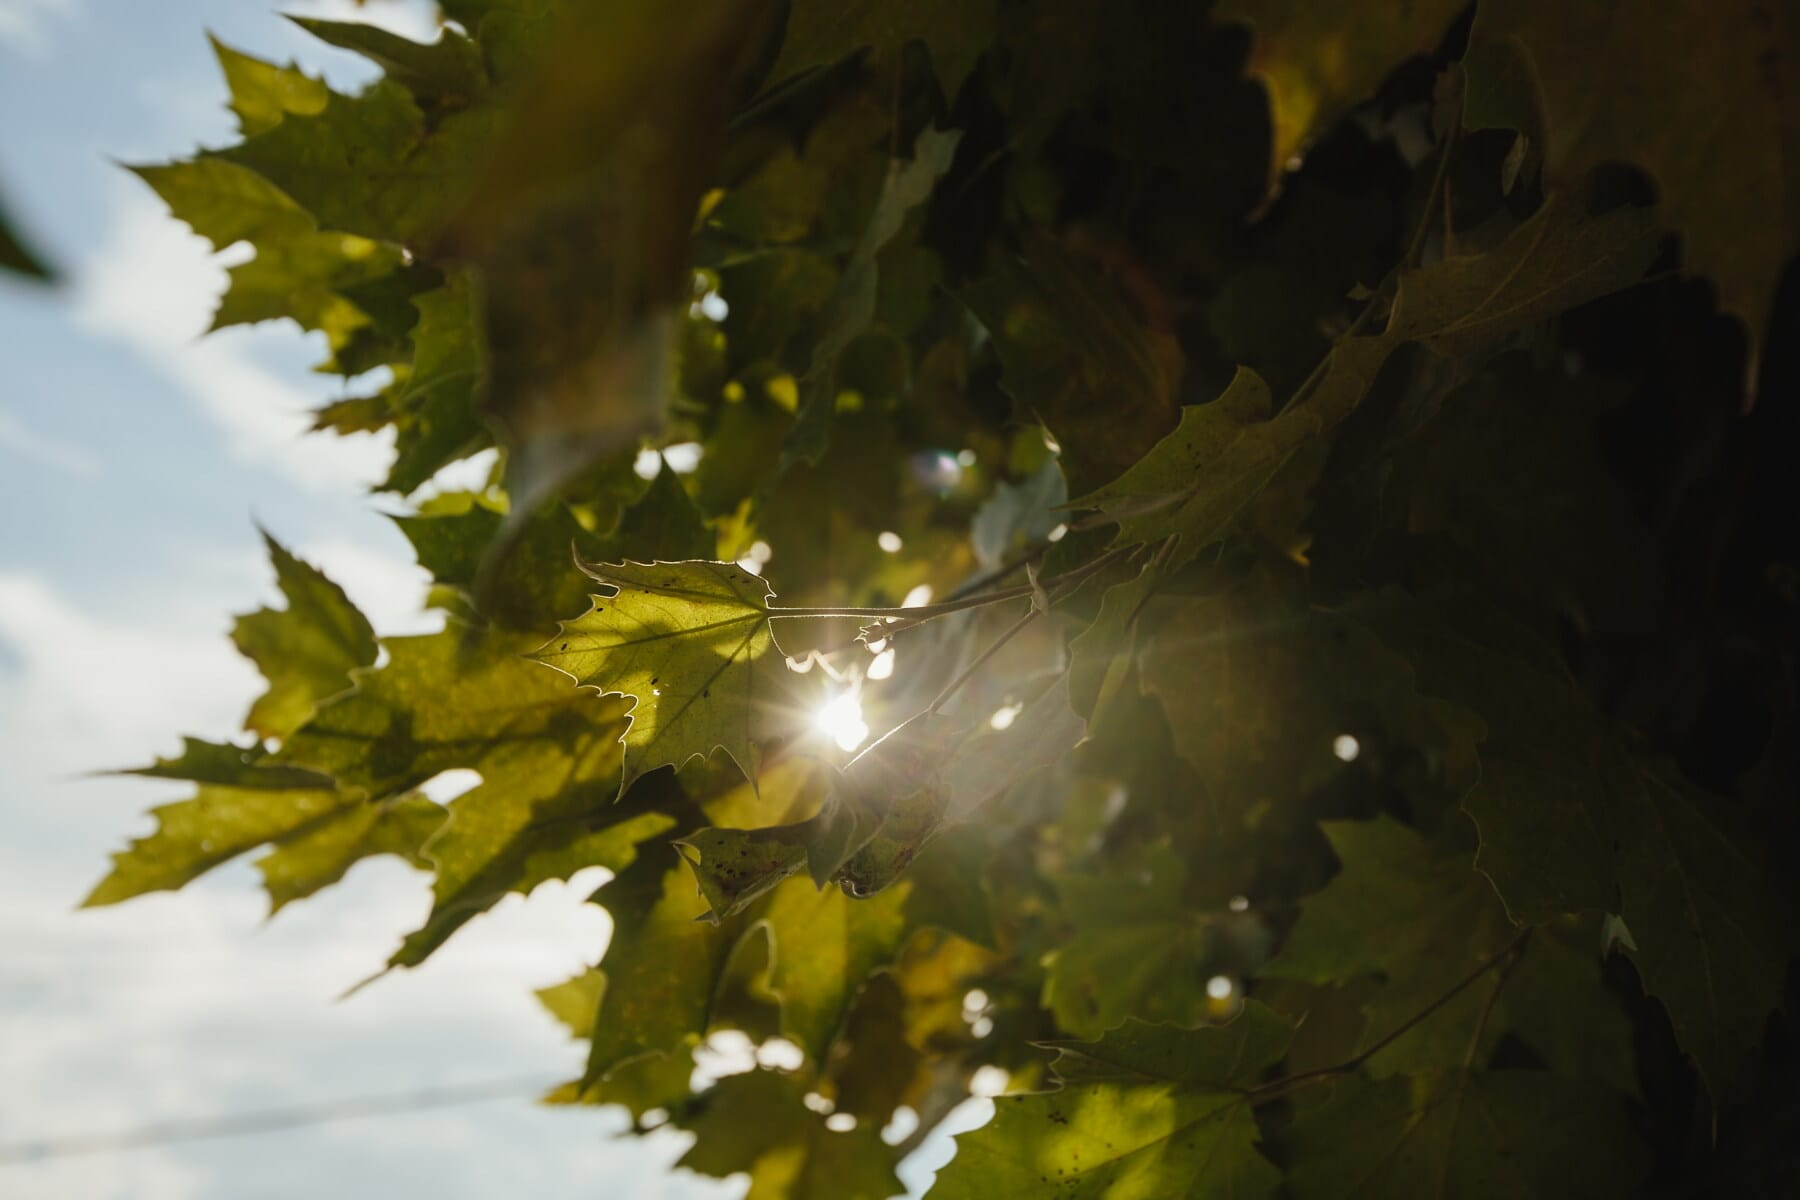 sunlight, green leaves, sunrays, foliage, tree, plant, maple, leaves, forest, leaf